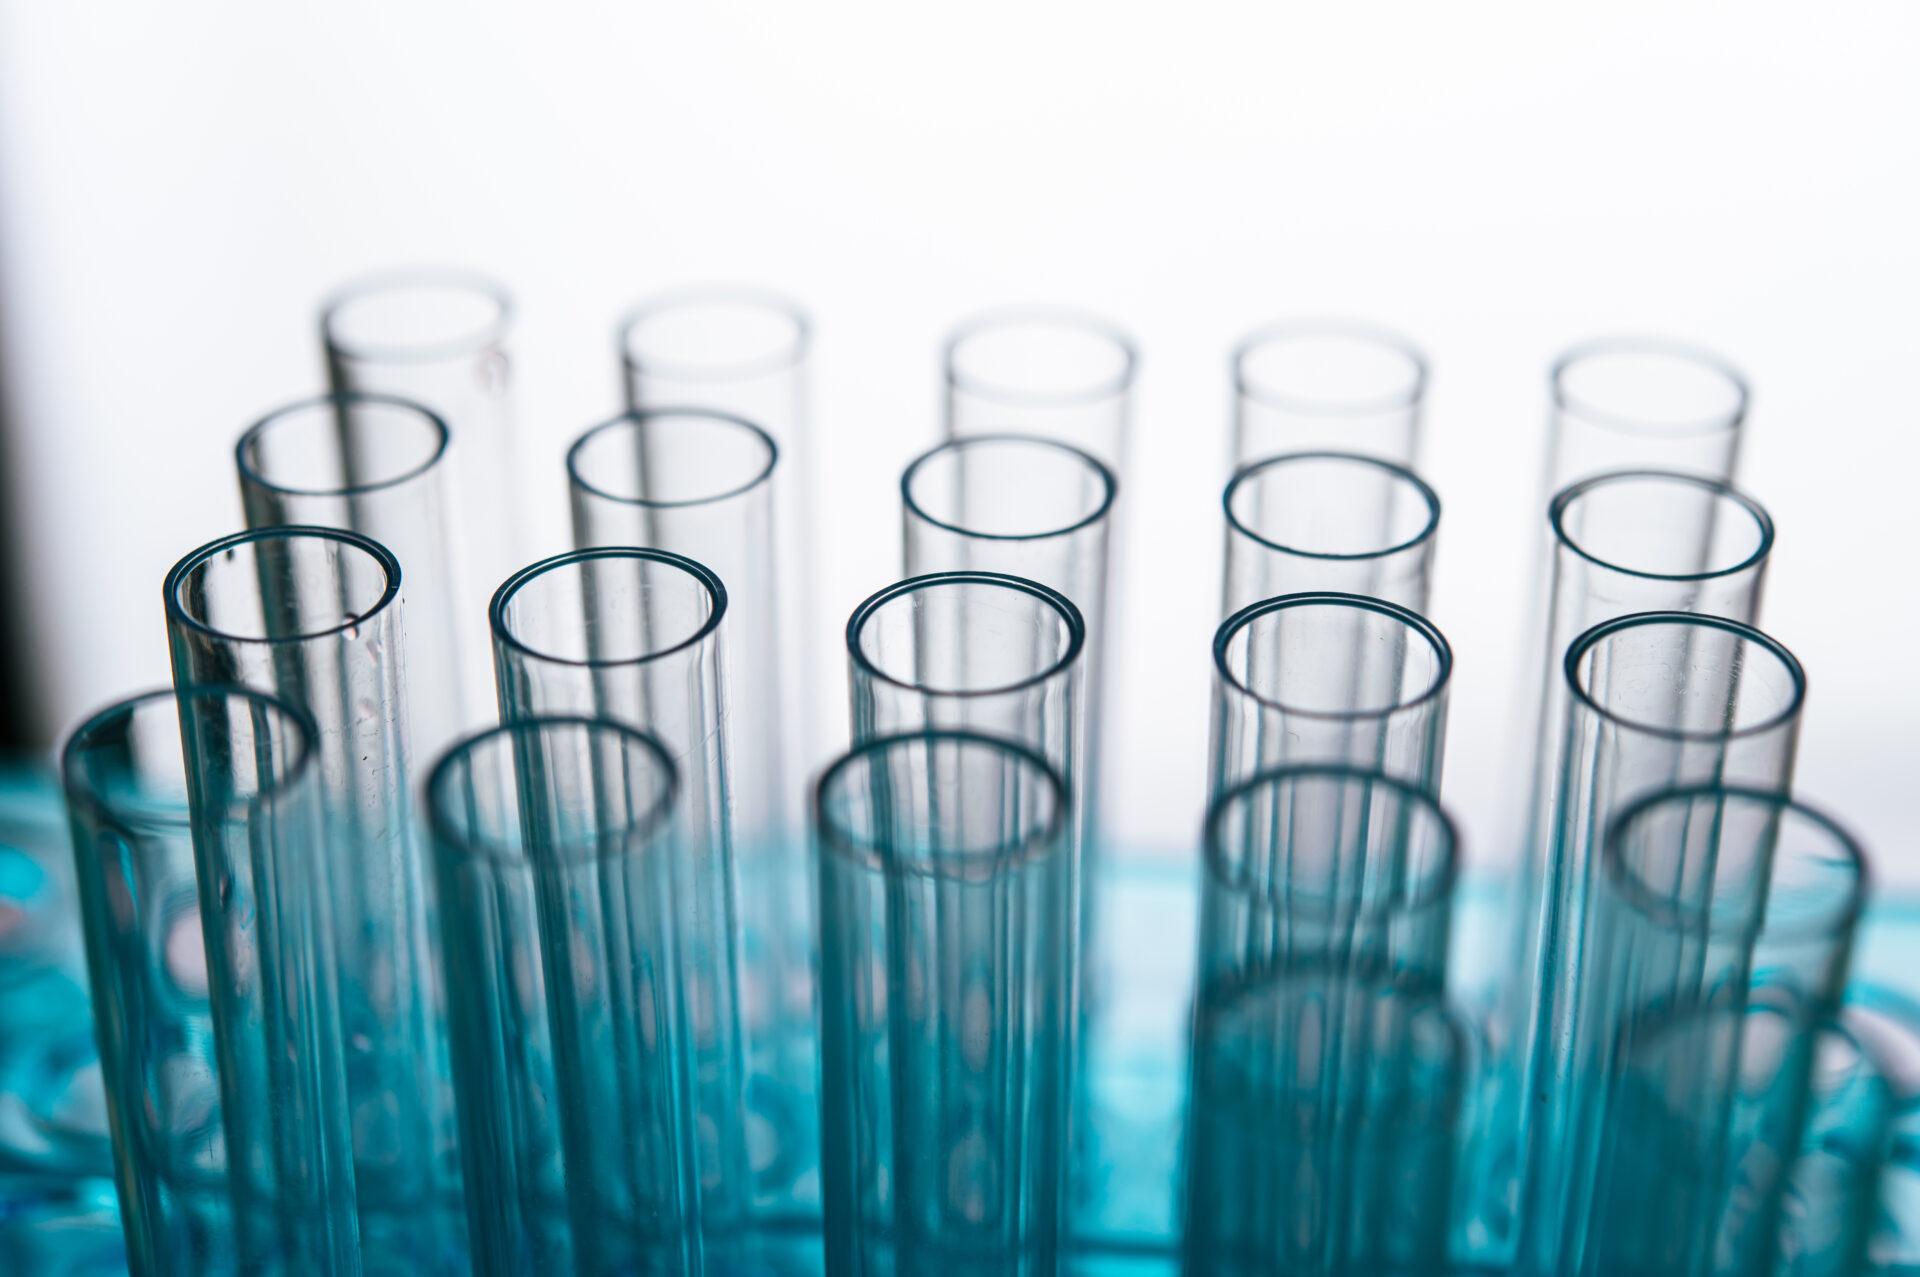 Science tubes arranged on the shelf.